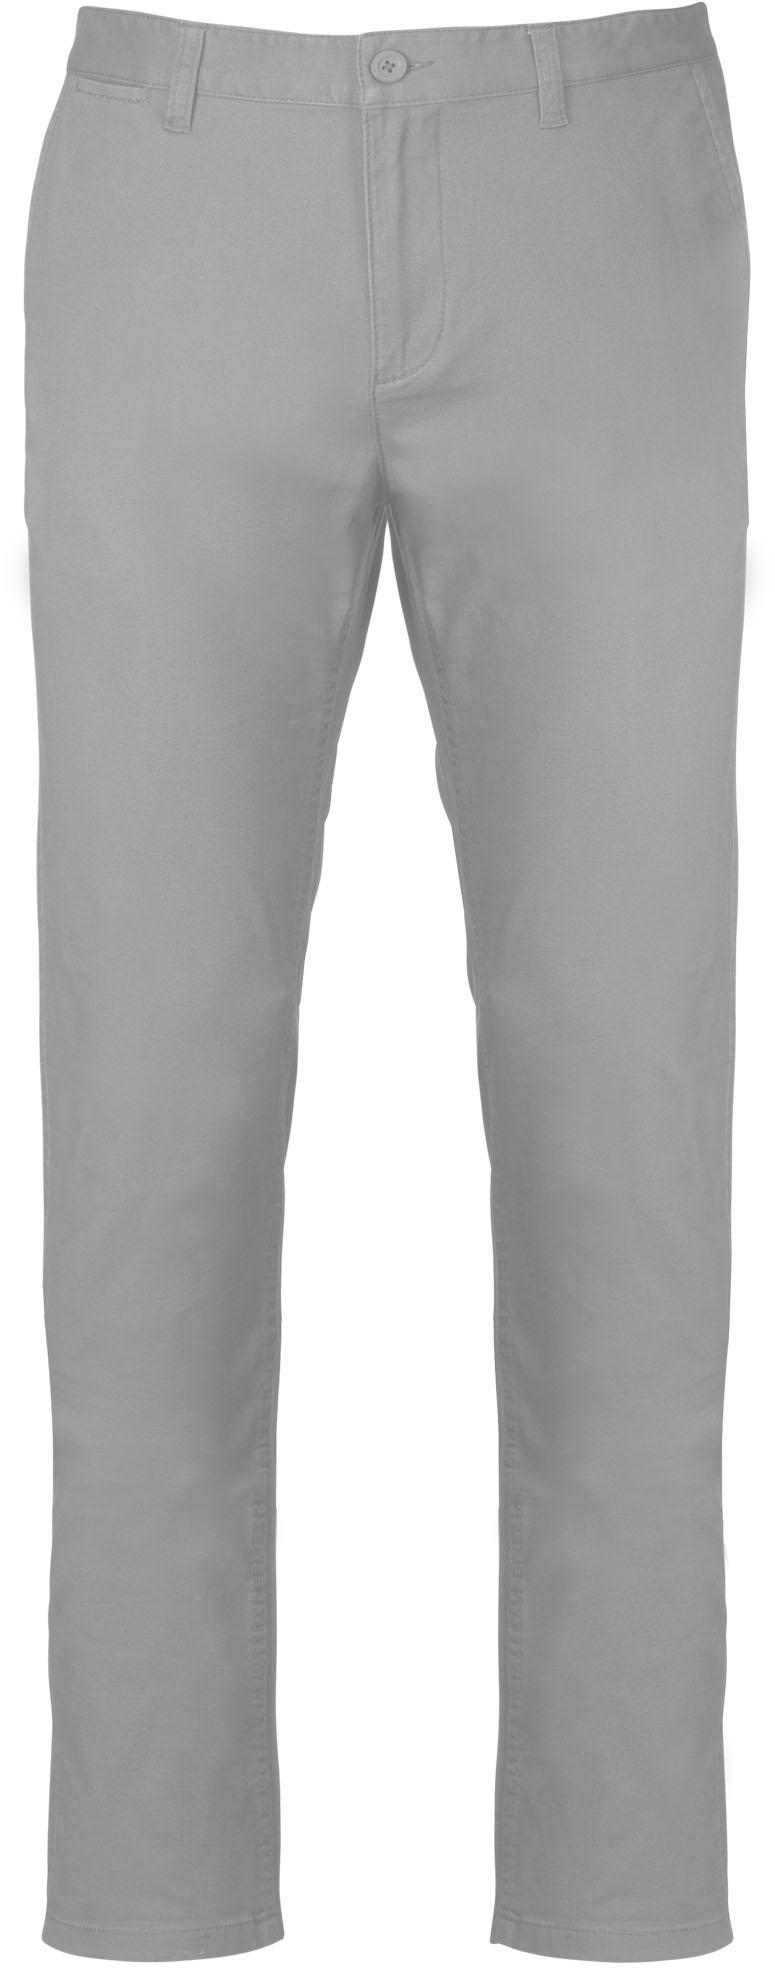 Pantalon chino homme - 2-1478-8